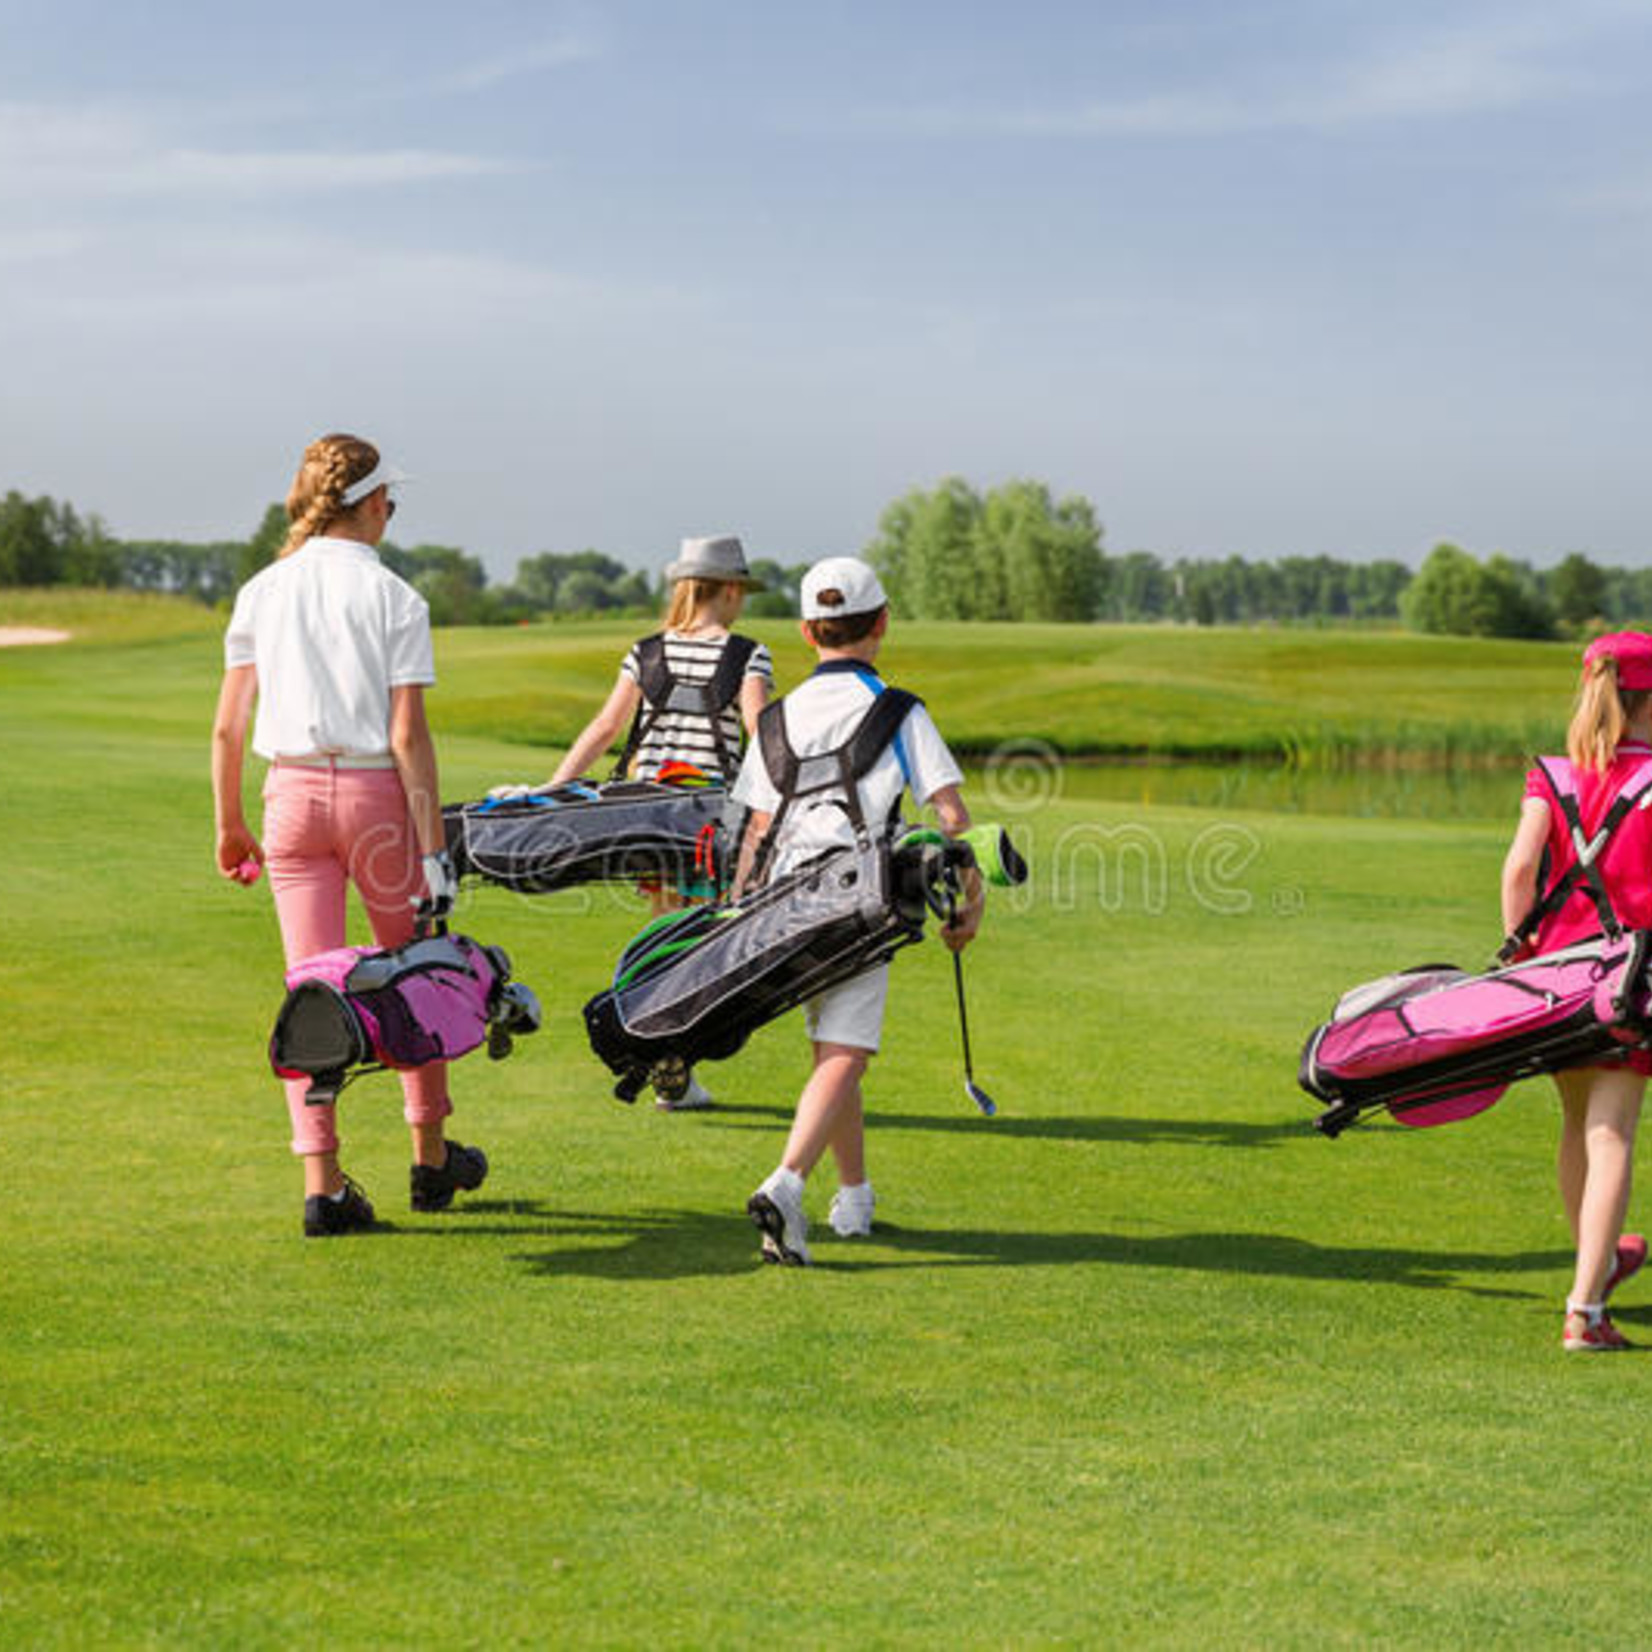 2021 Spring Break Camp Ages 8-14 #2 Thur/Fri April 8/9 11:00-2:00pm